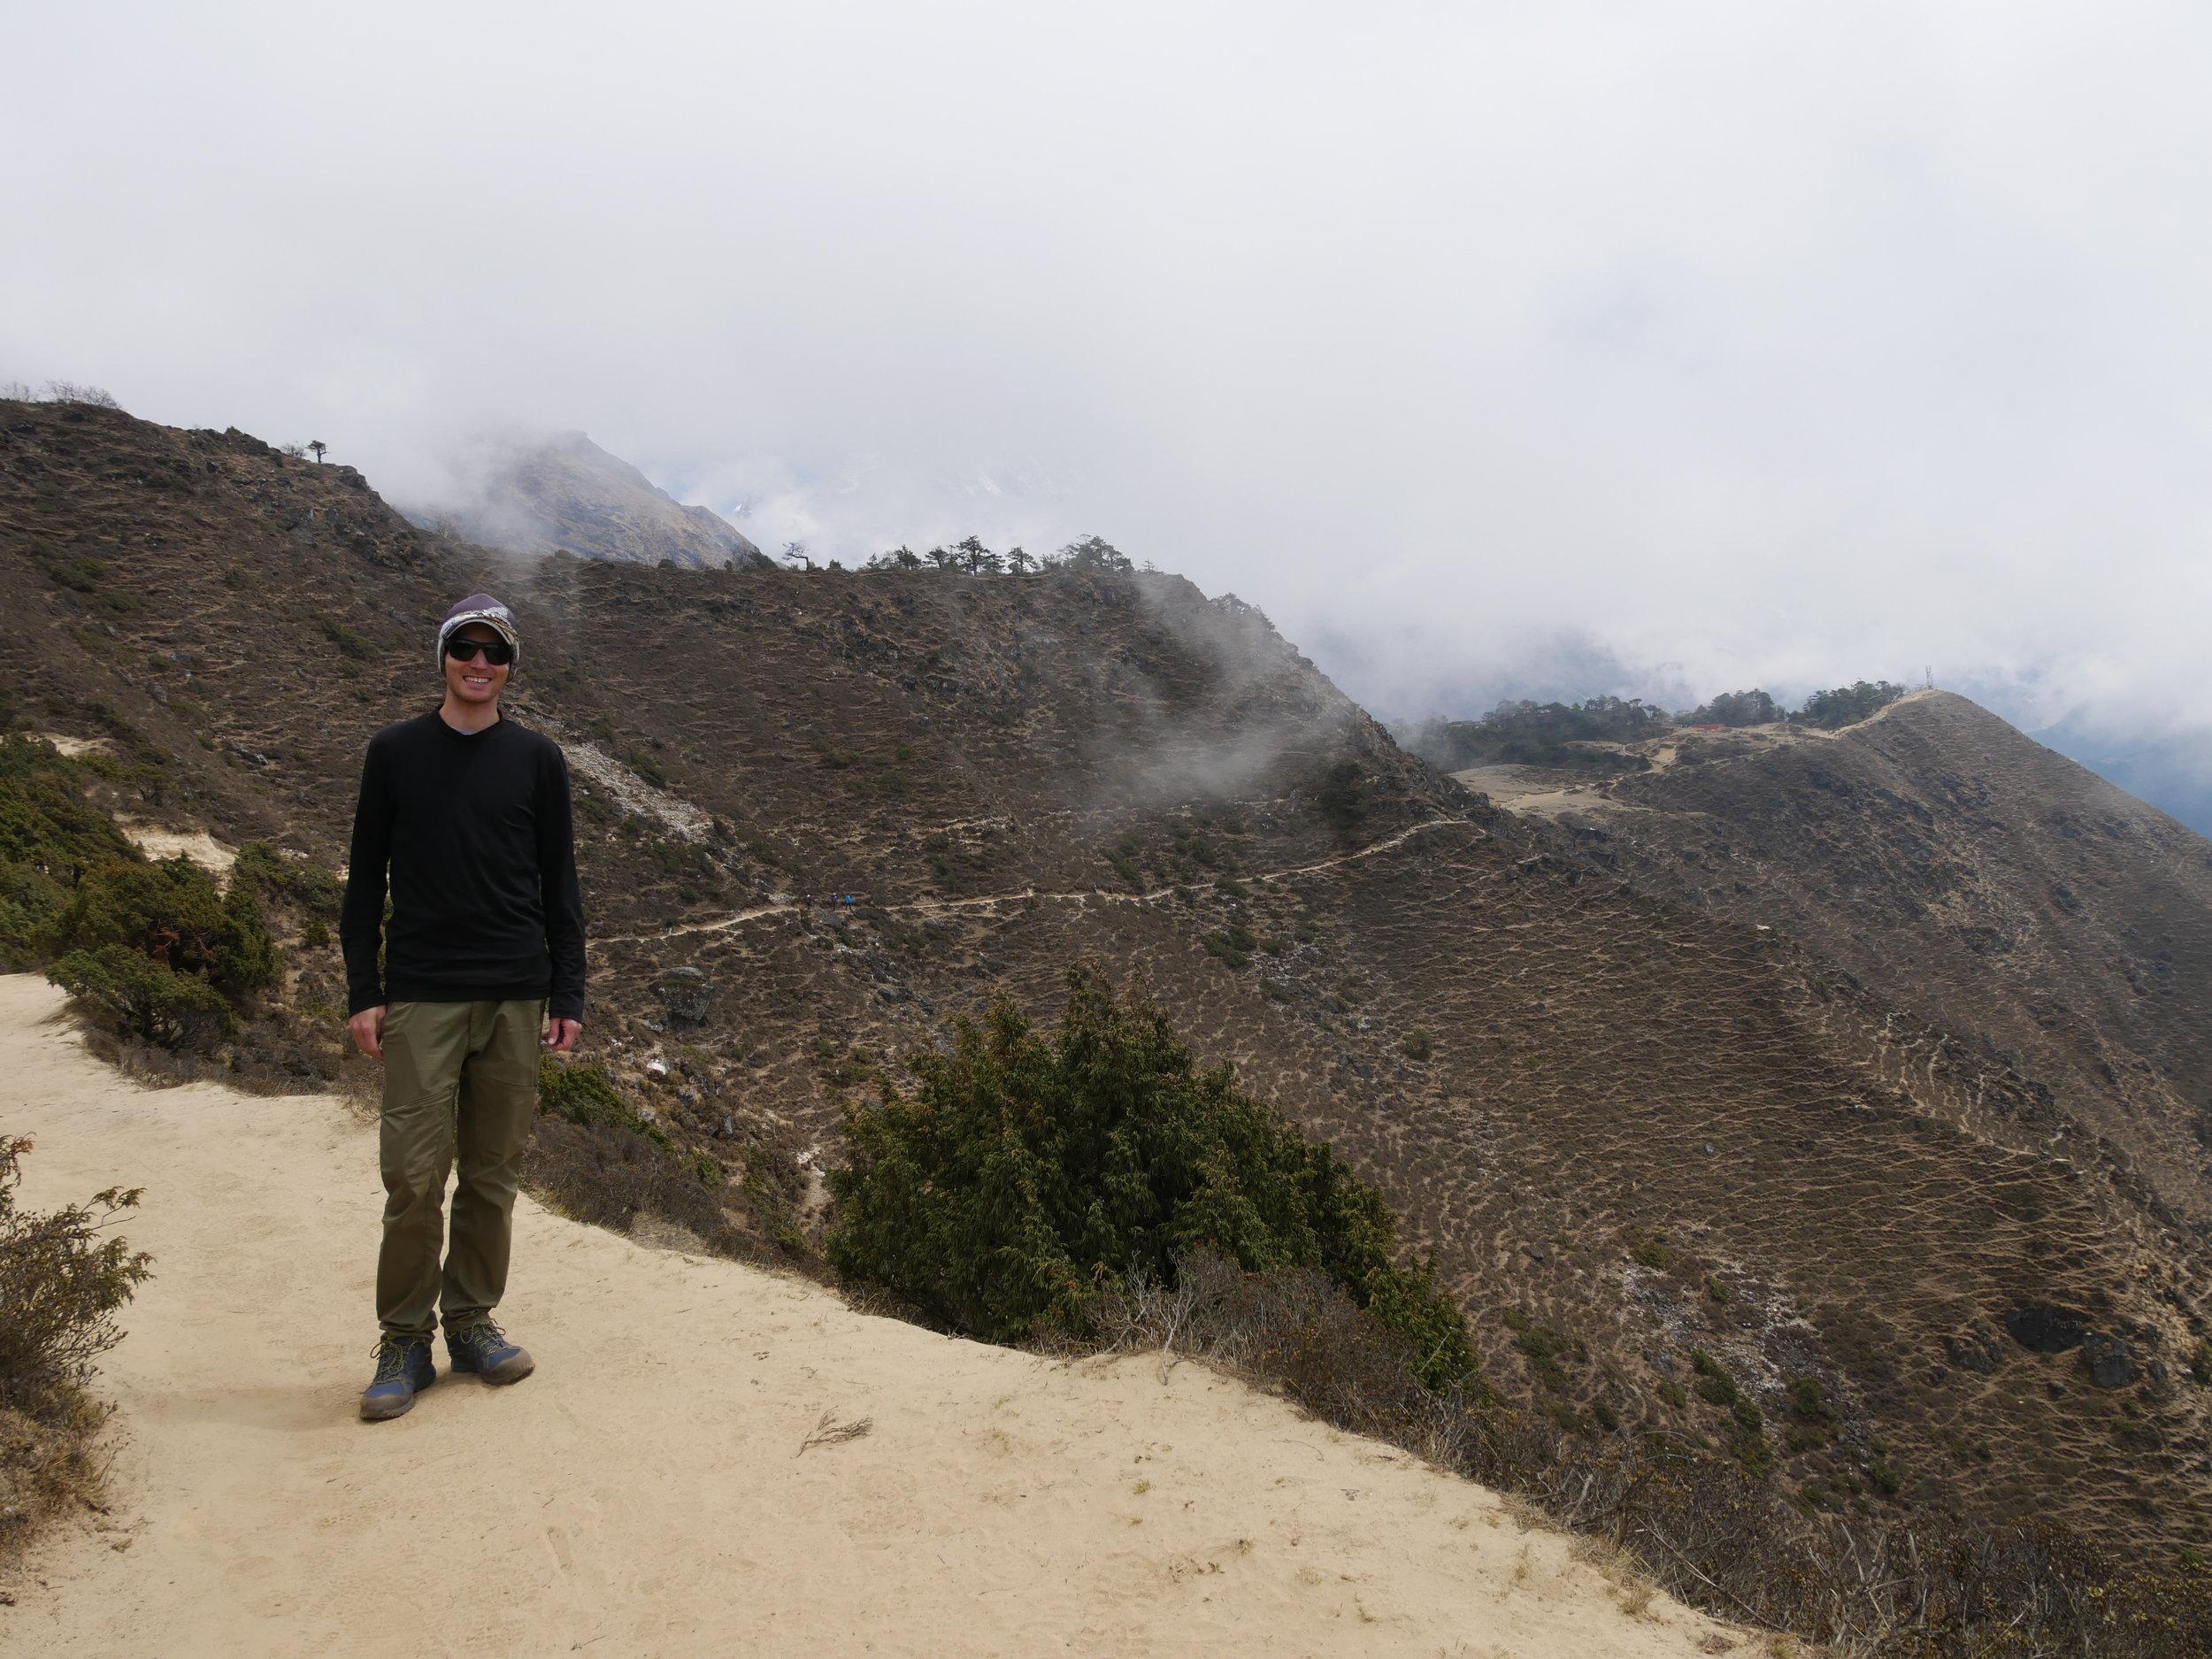 No Everest views here folks...